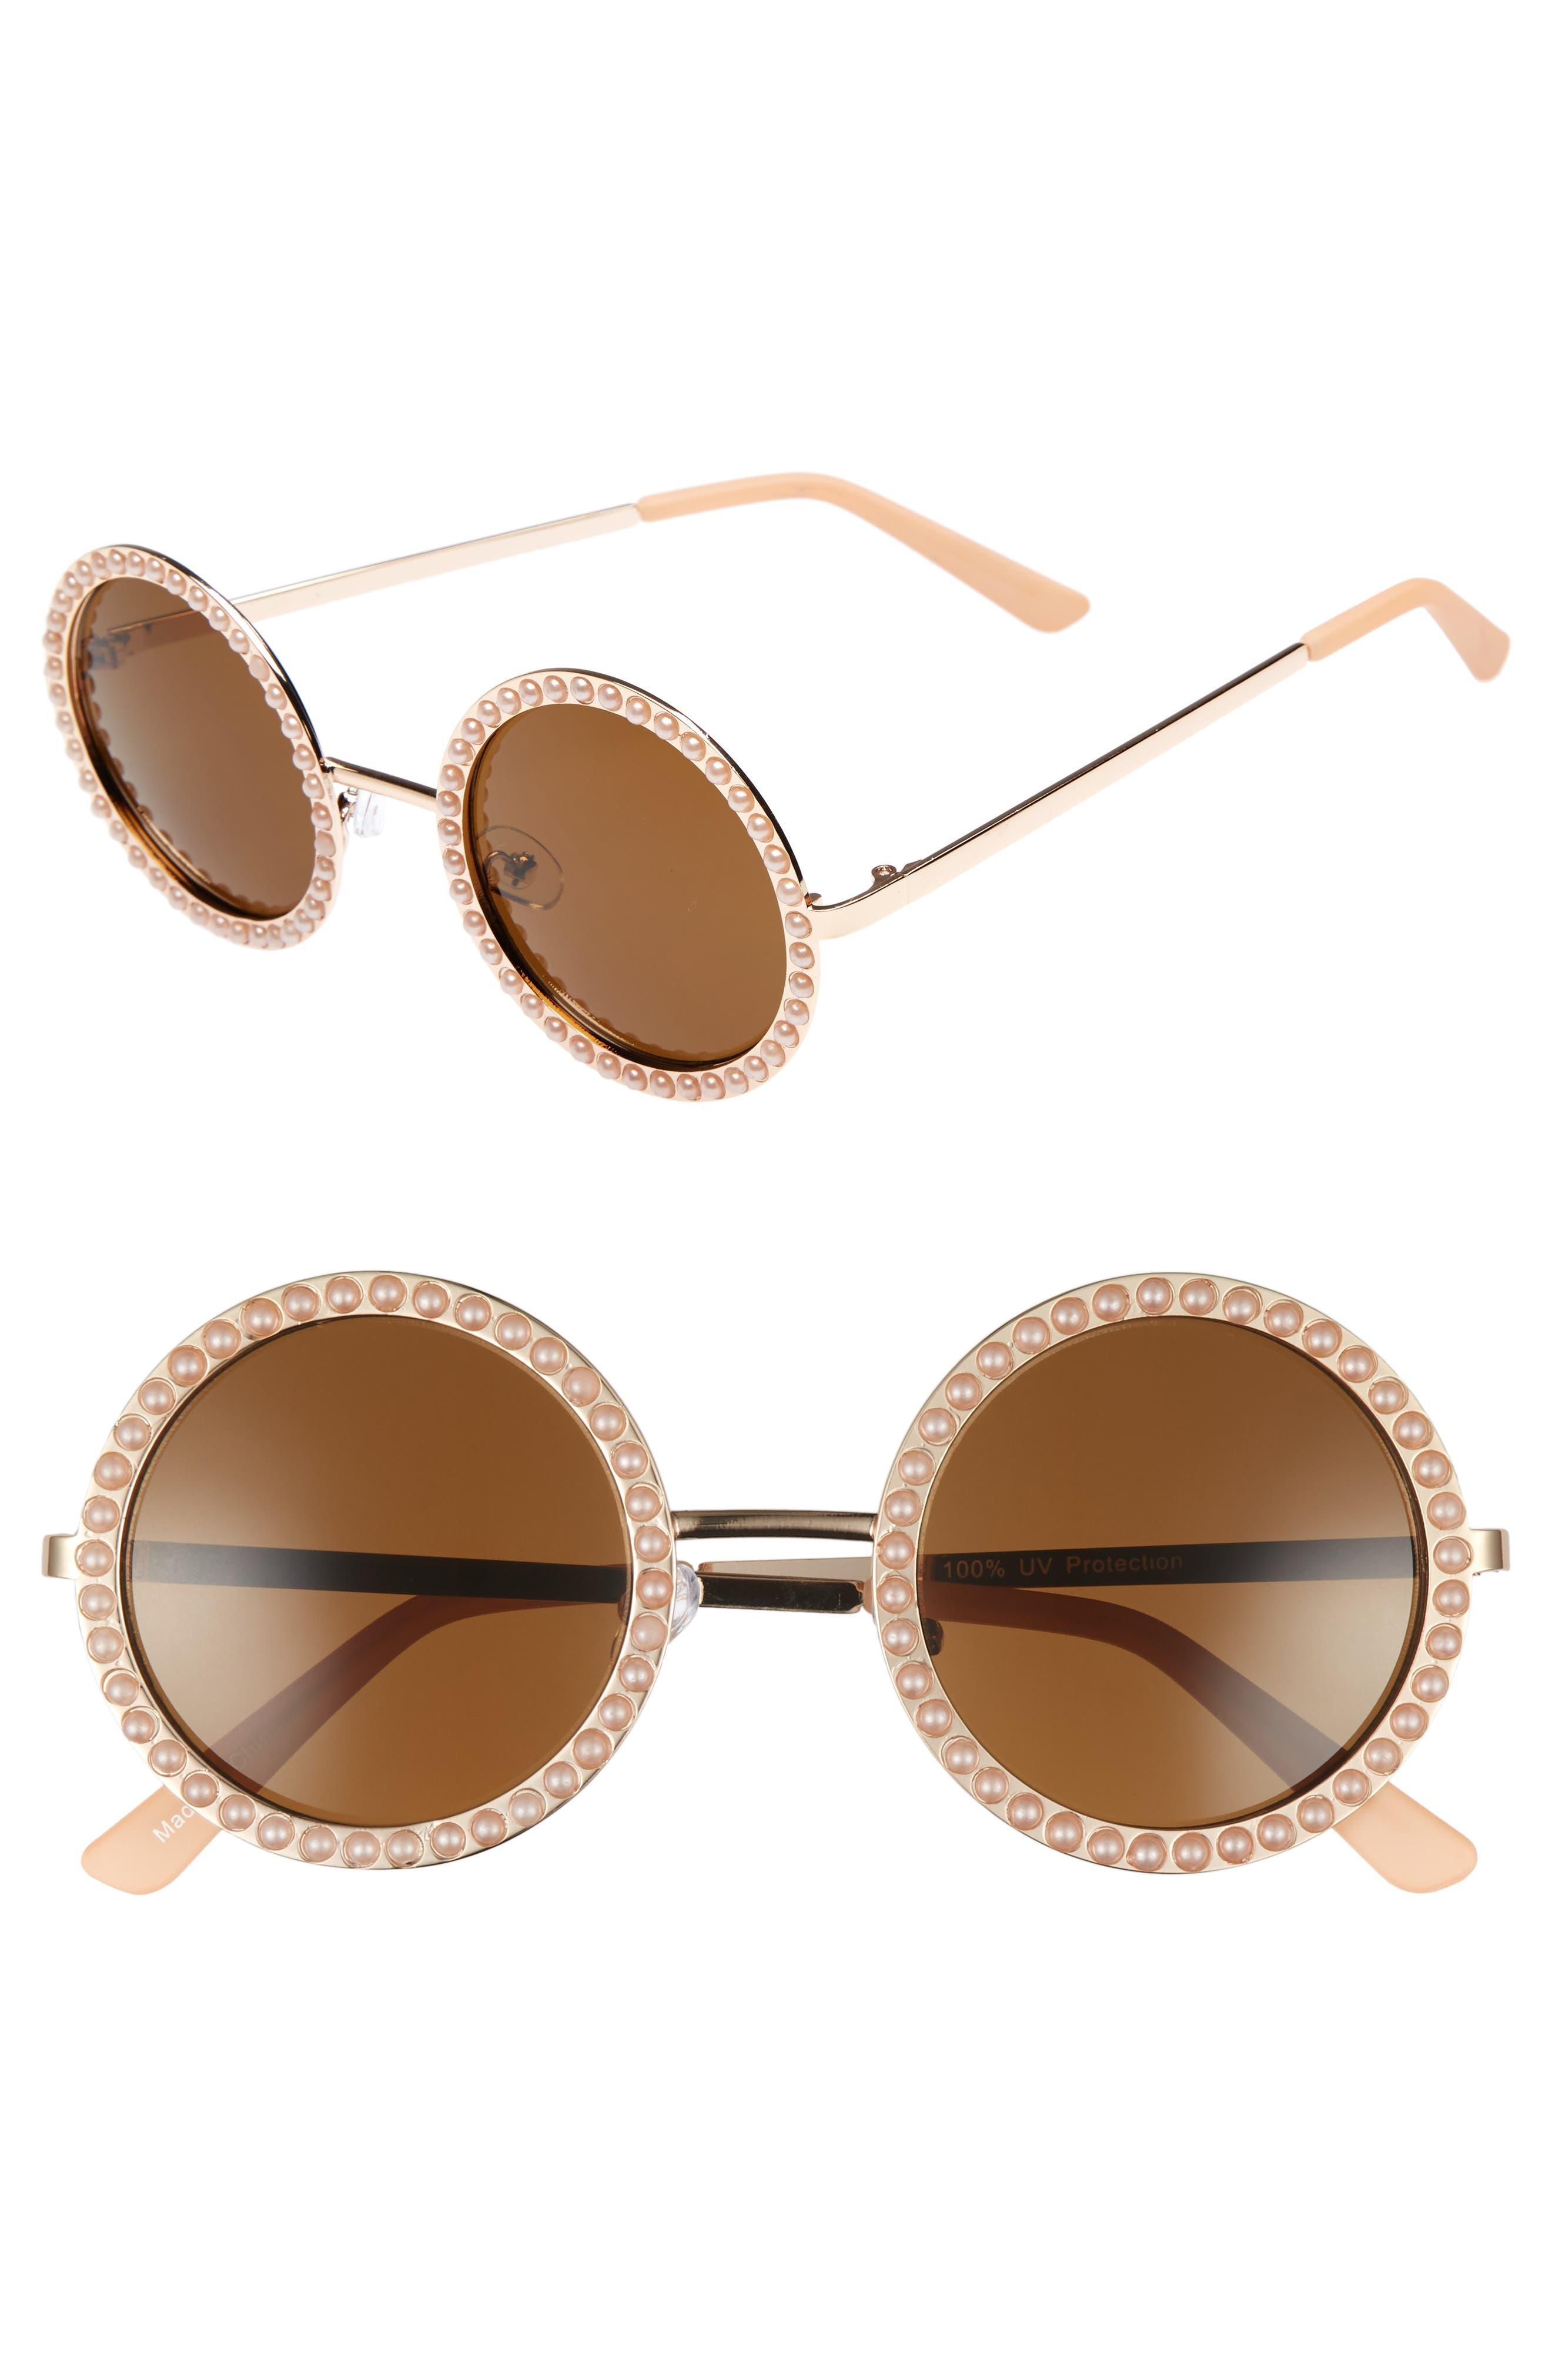 55mm Imitation Pearl Round Sunglasses,                         Main,                         color, 710